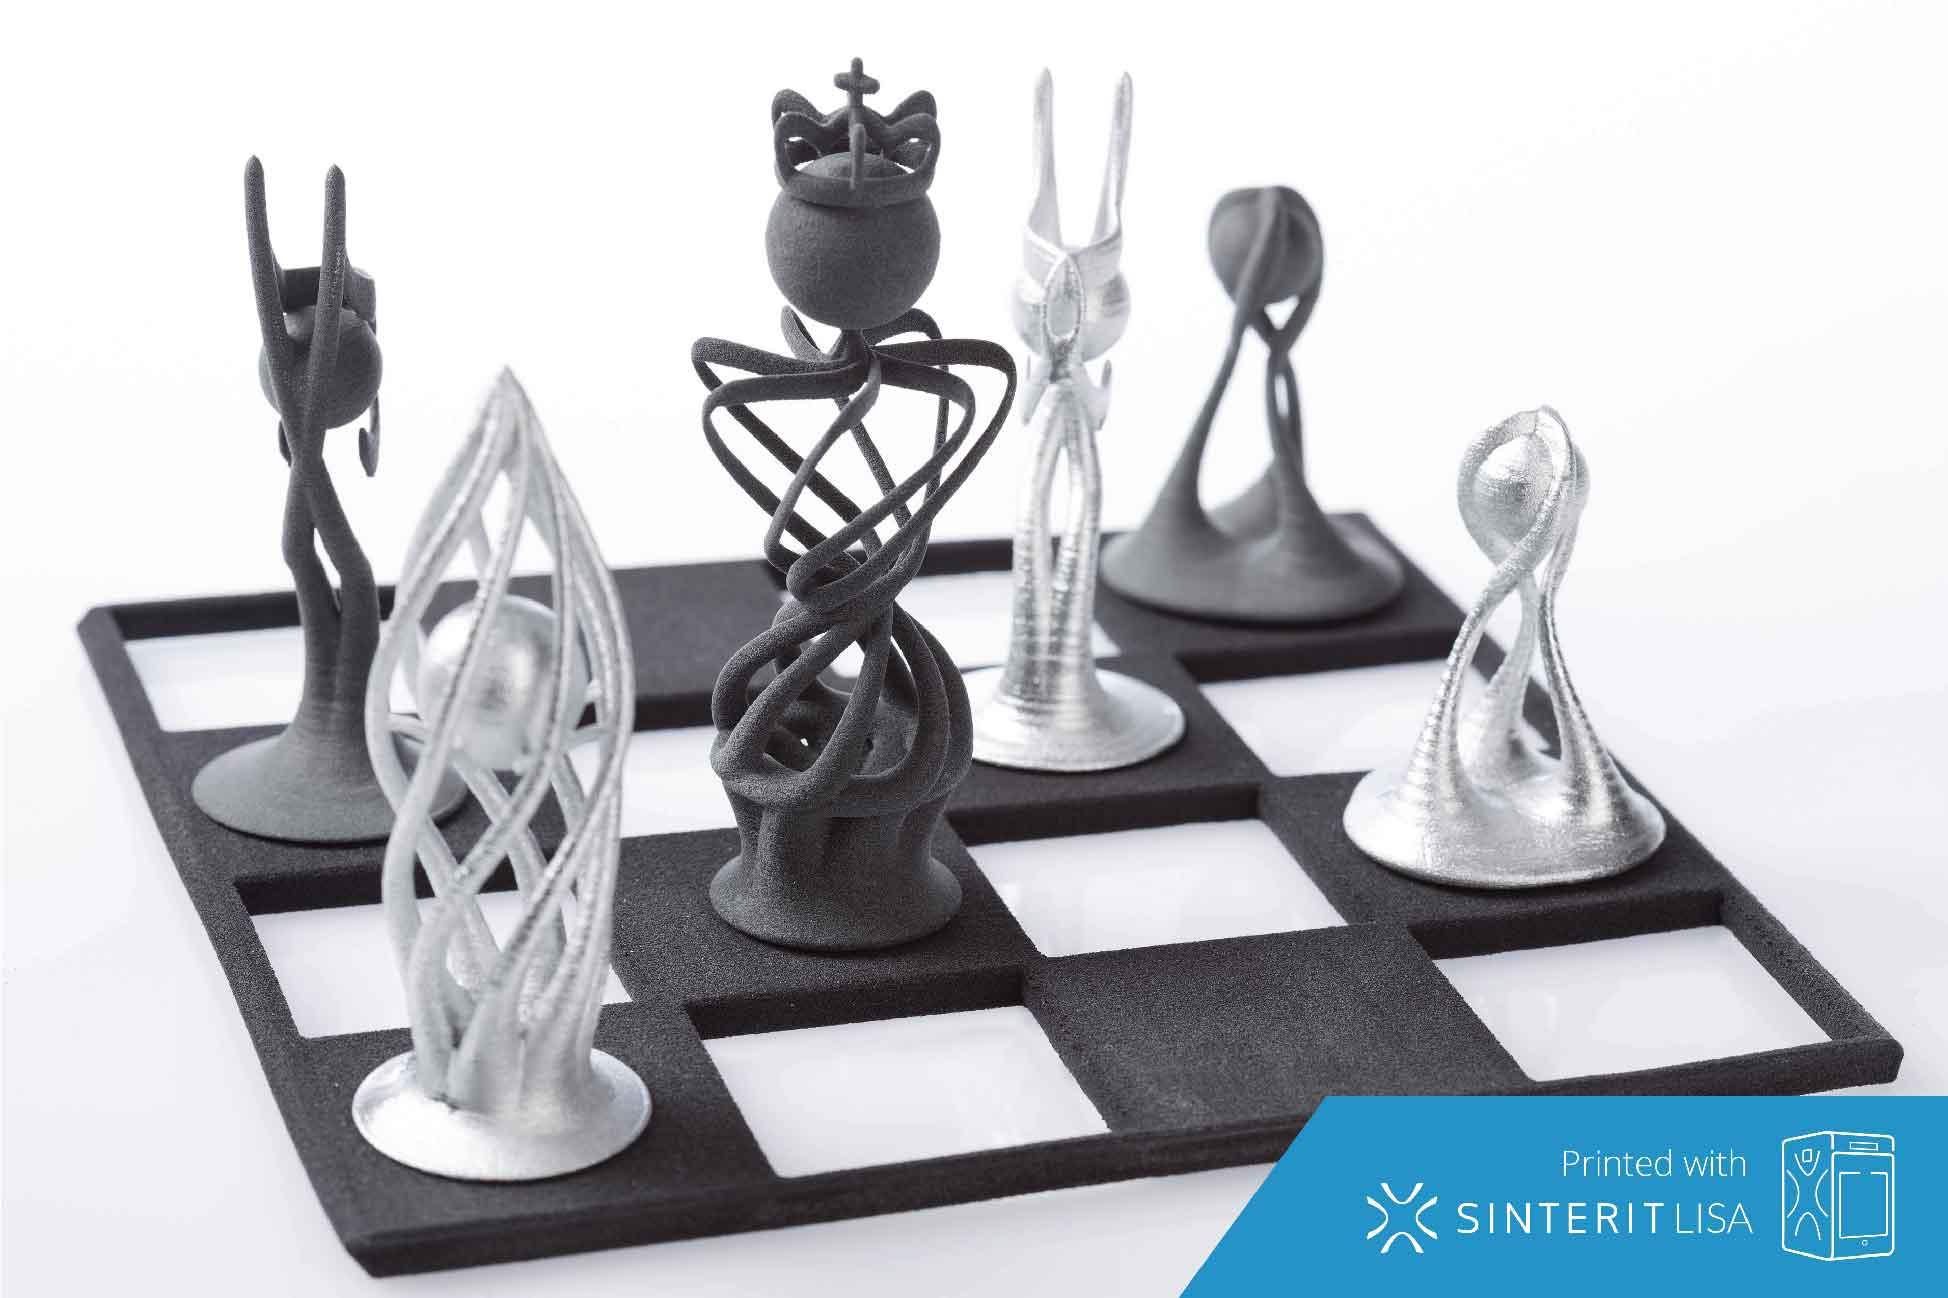 Sinterit-Chesboard-with-chess-set Kopie.jpg